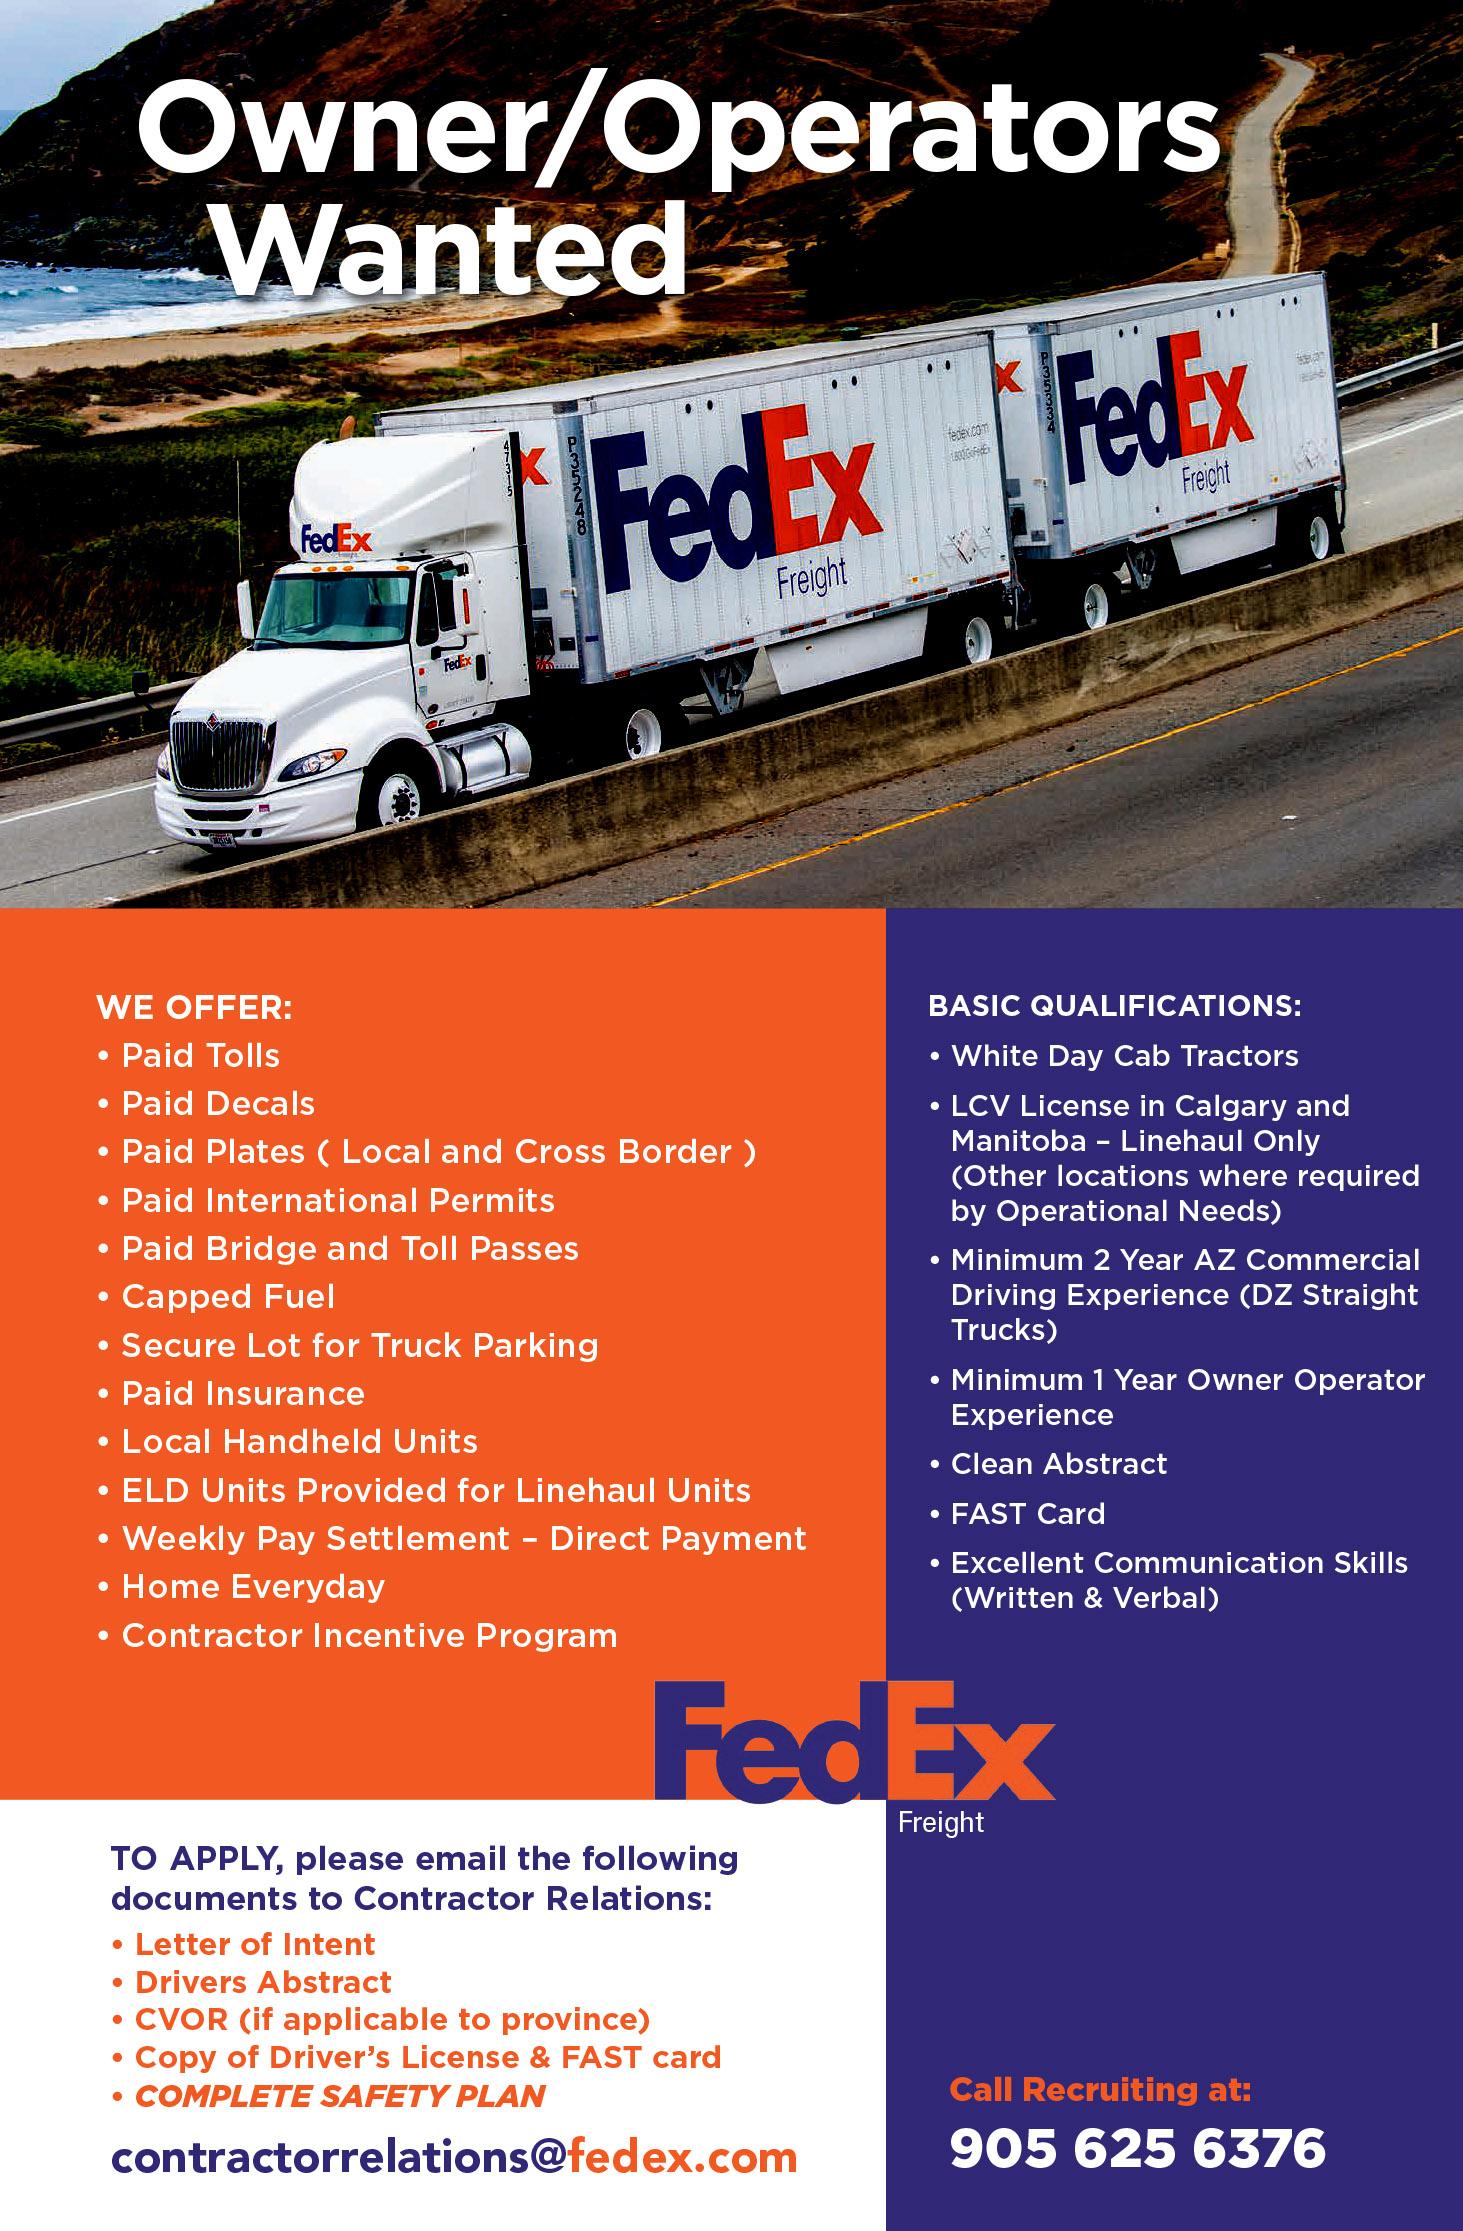 Fedex Freight Truck News